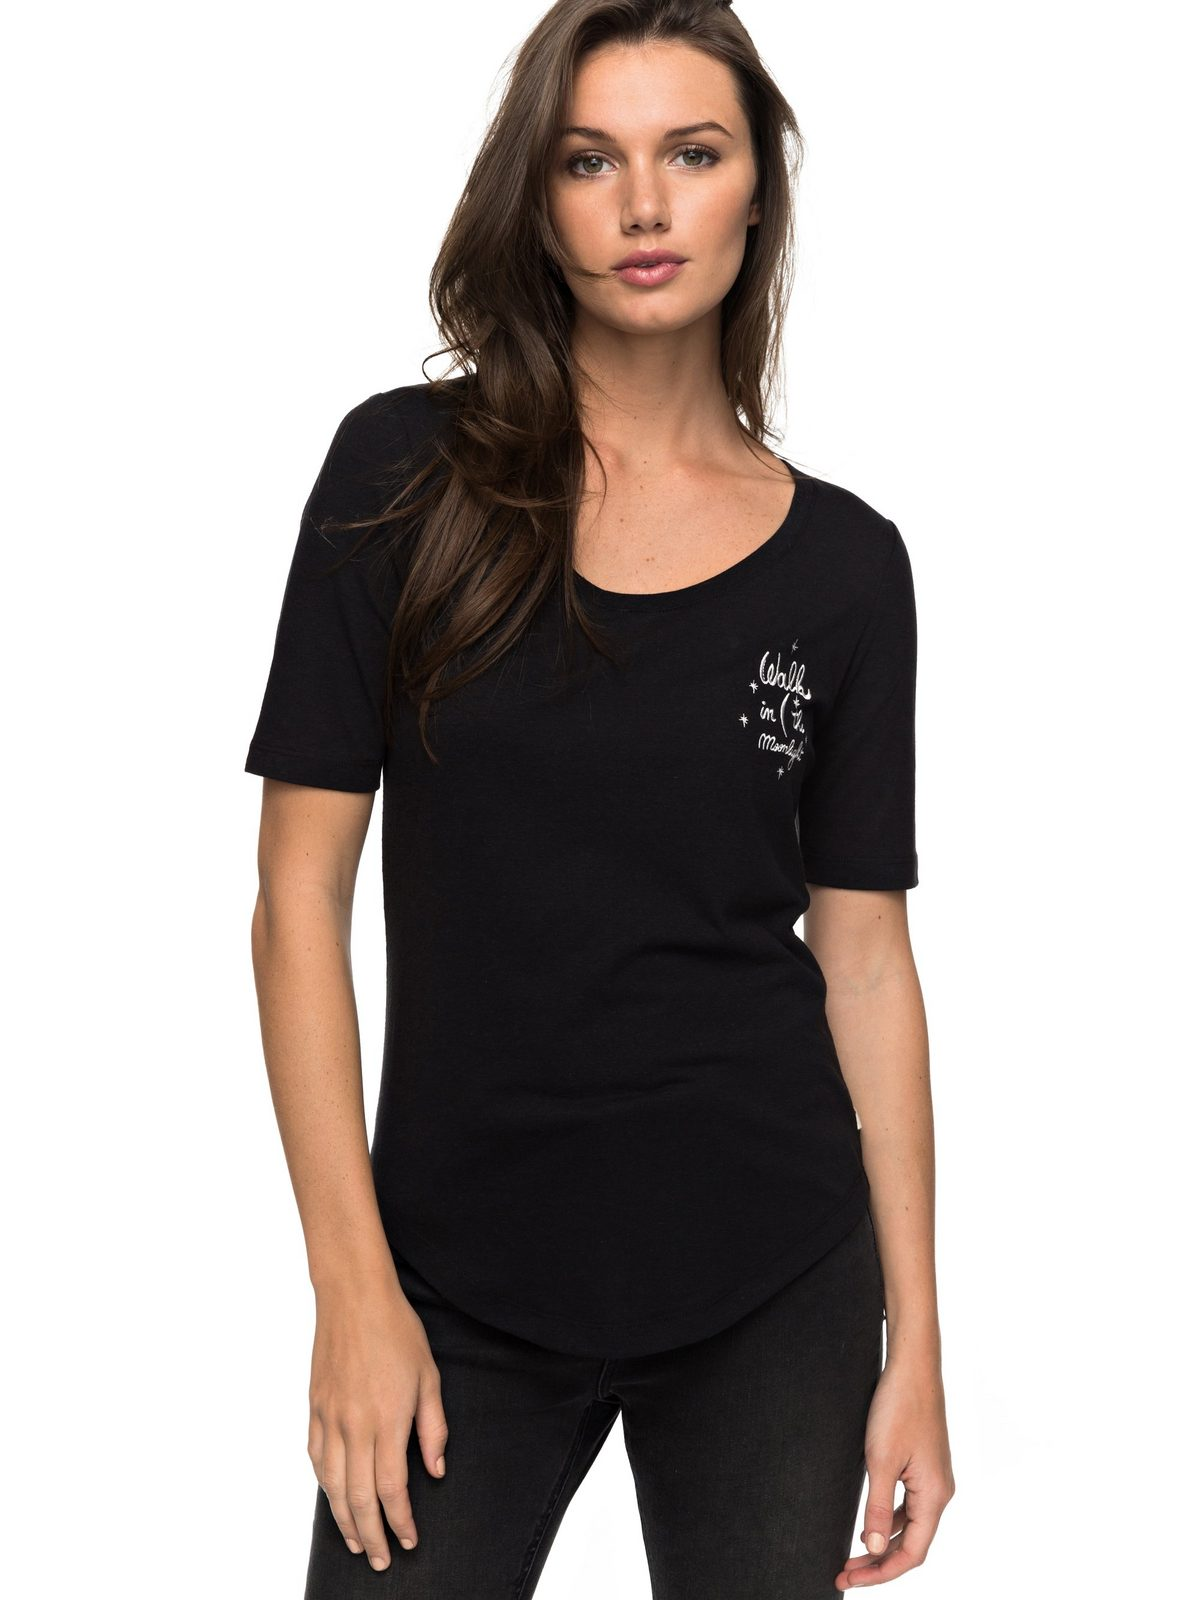 Roxy T-Shirt »Boogie Board Lace Up« - broschei